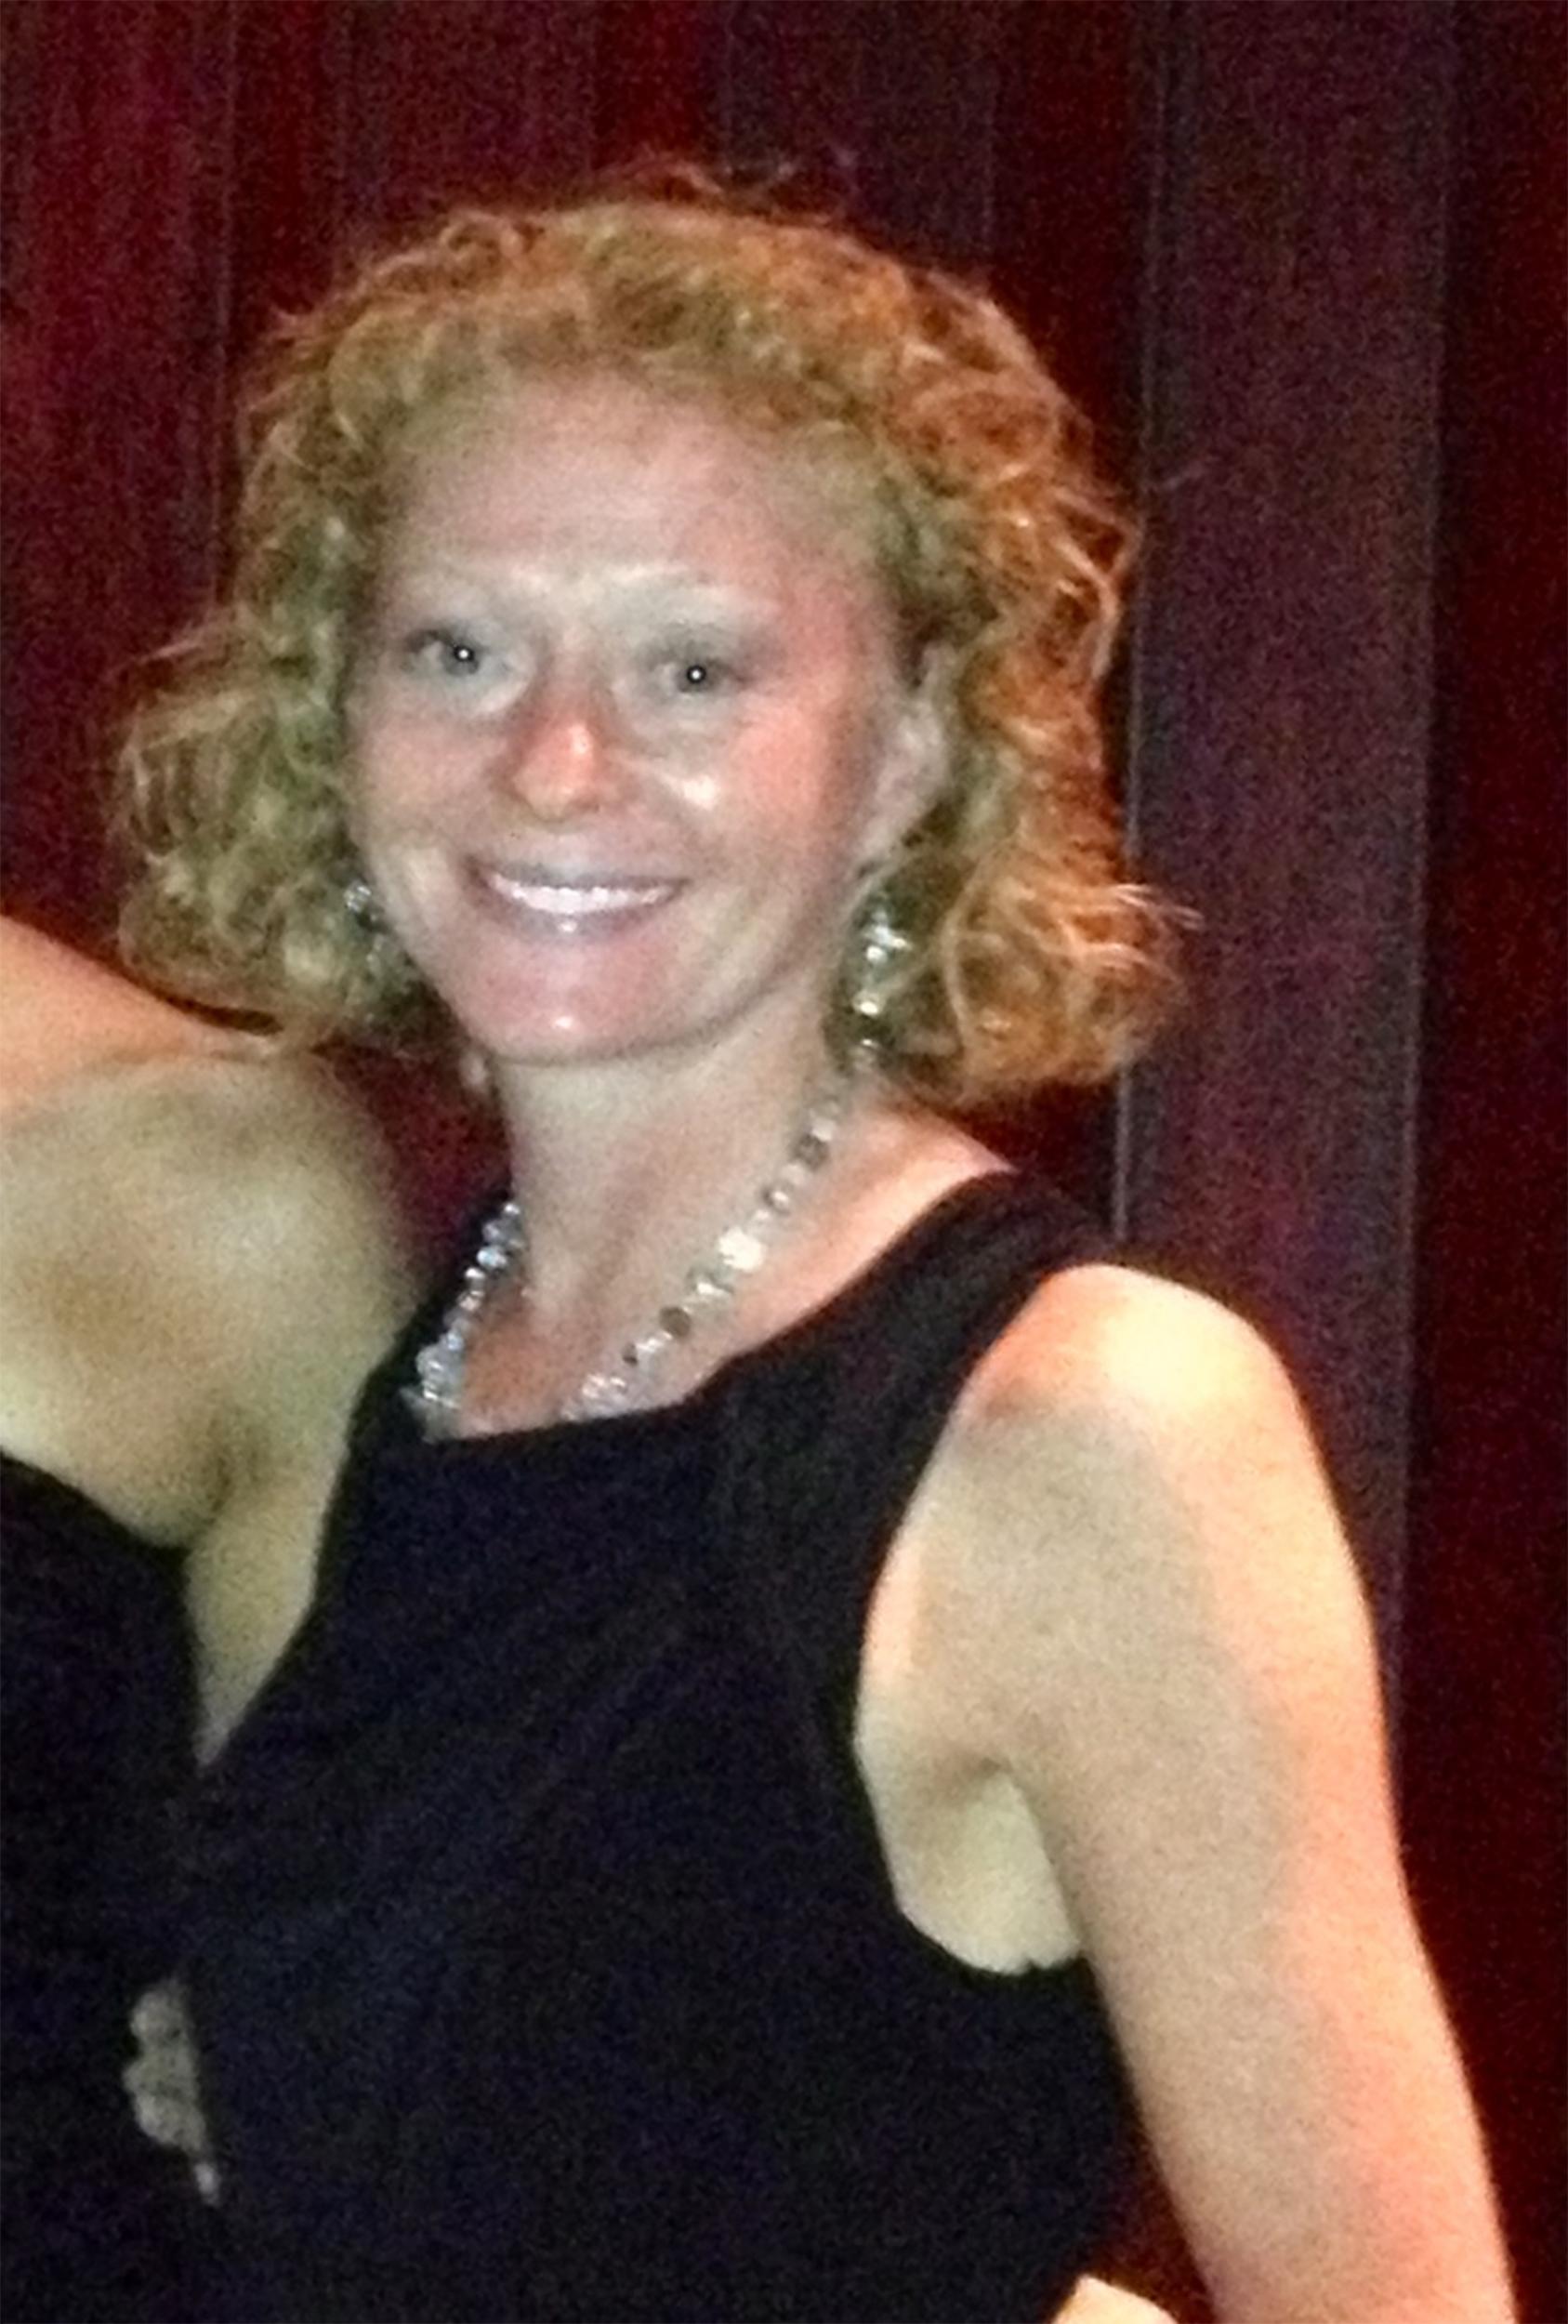 Woman-killed-by-alligator-while-walking-dog-in-South-Carolina